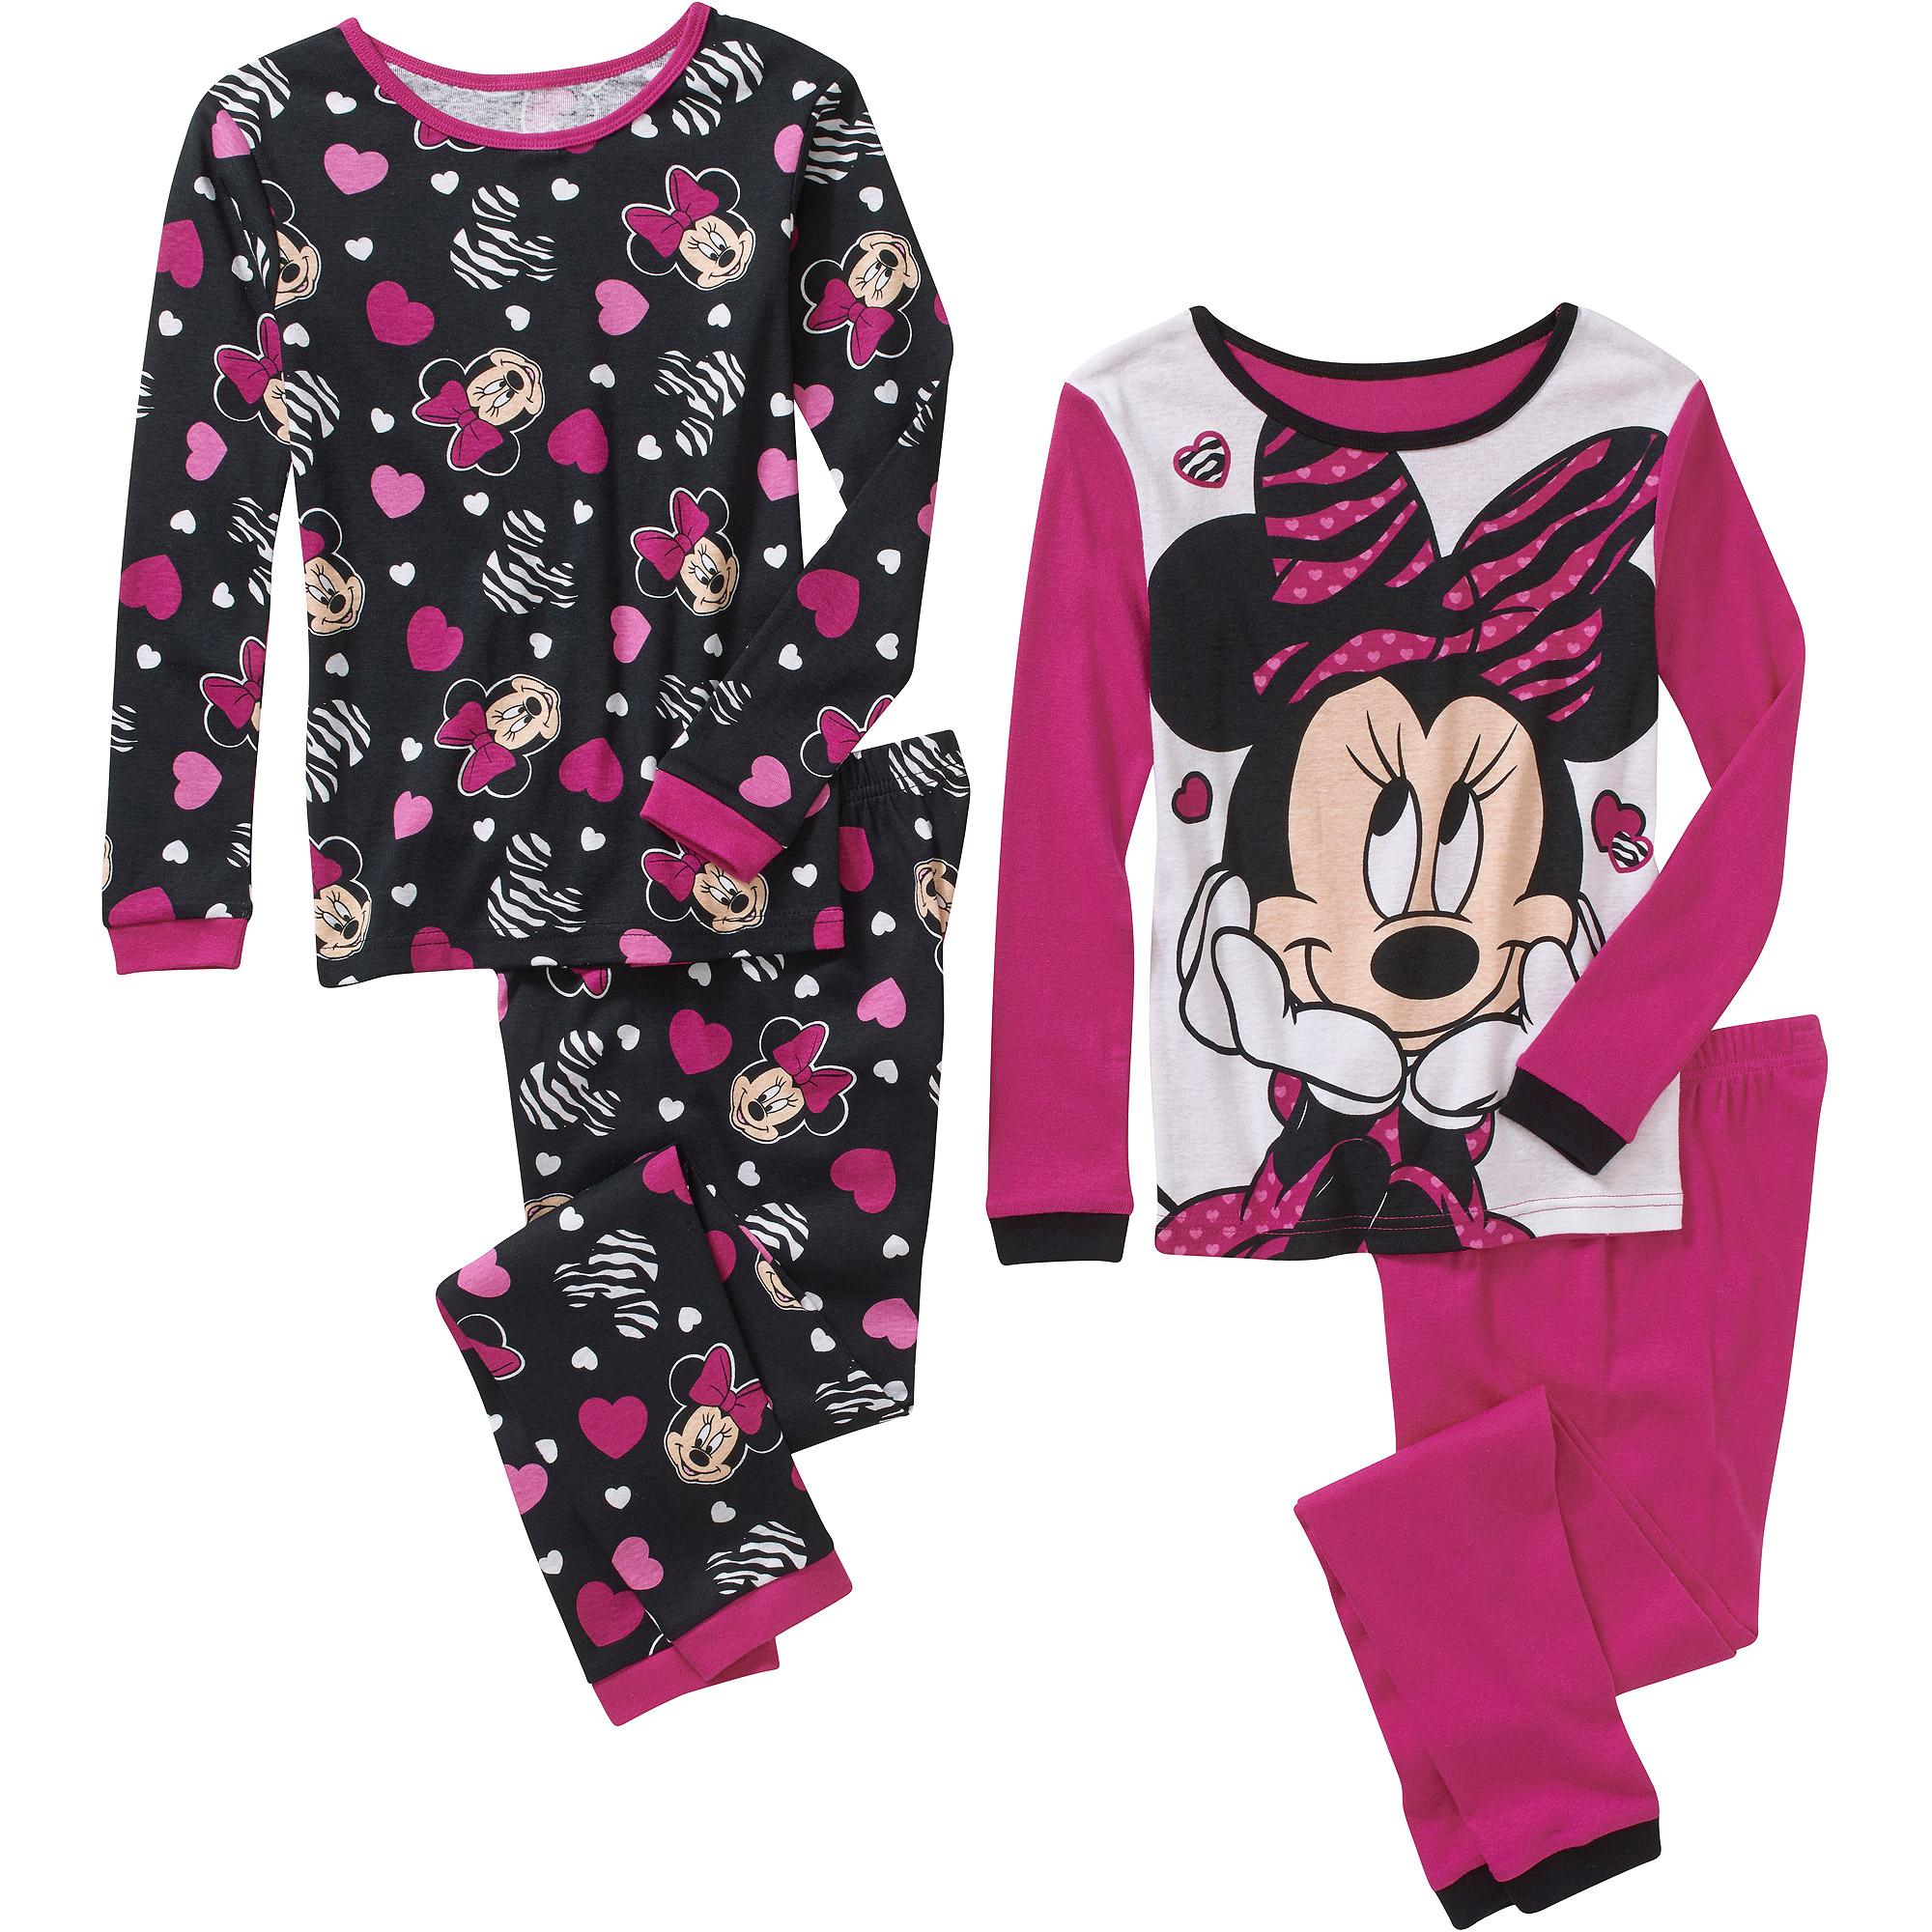 Girls' Minnie Mouse 4 Piece Cotton Pajama Set